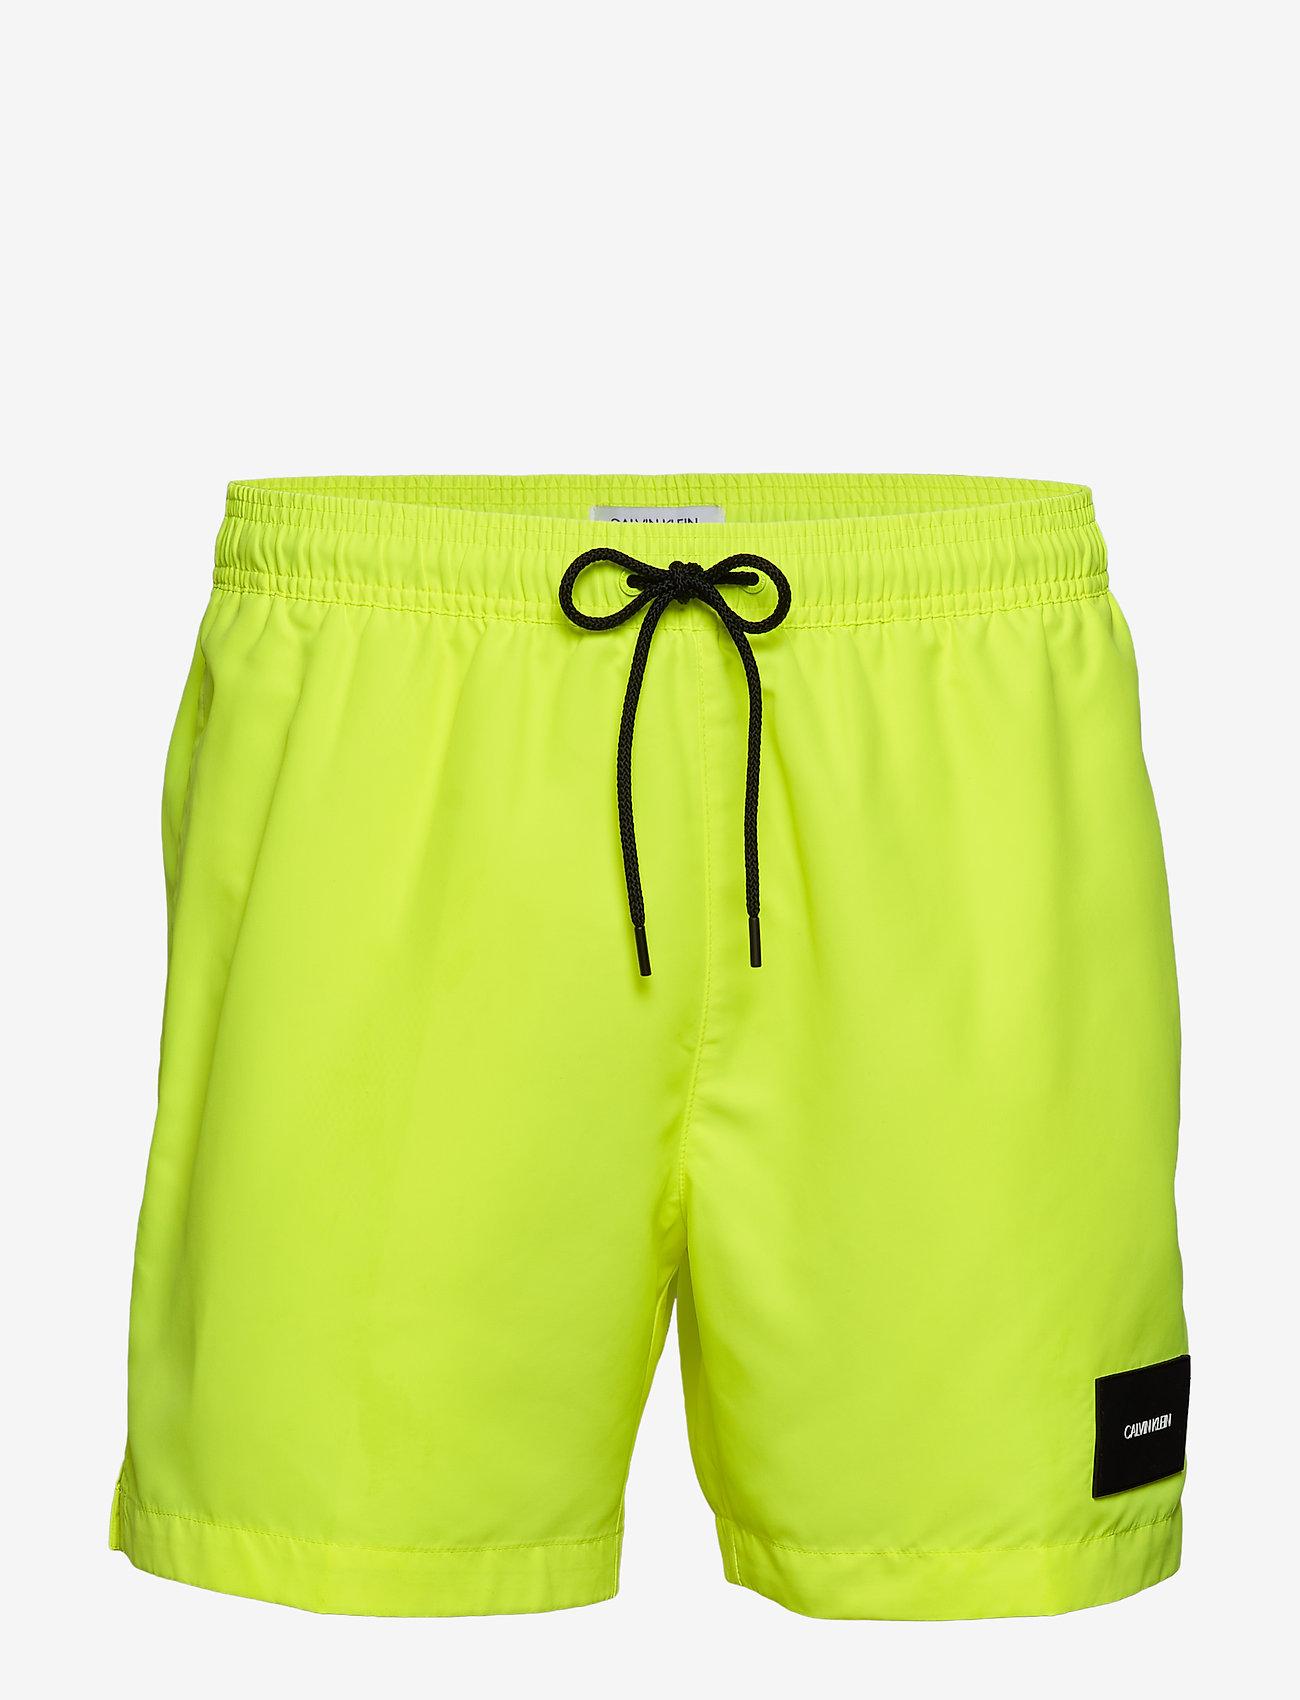 Calvin Klein - MEDIUM DRAWSTRING - badehosen - safety yellow - 0